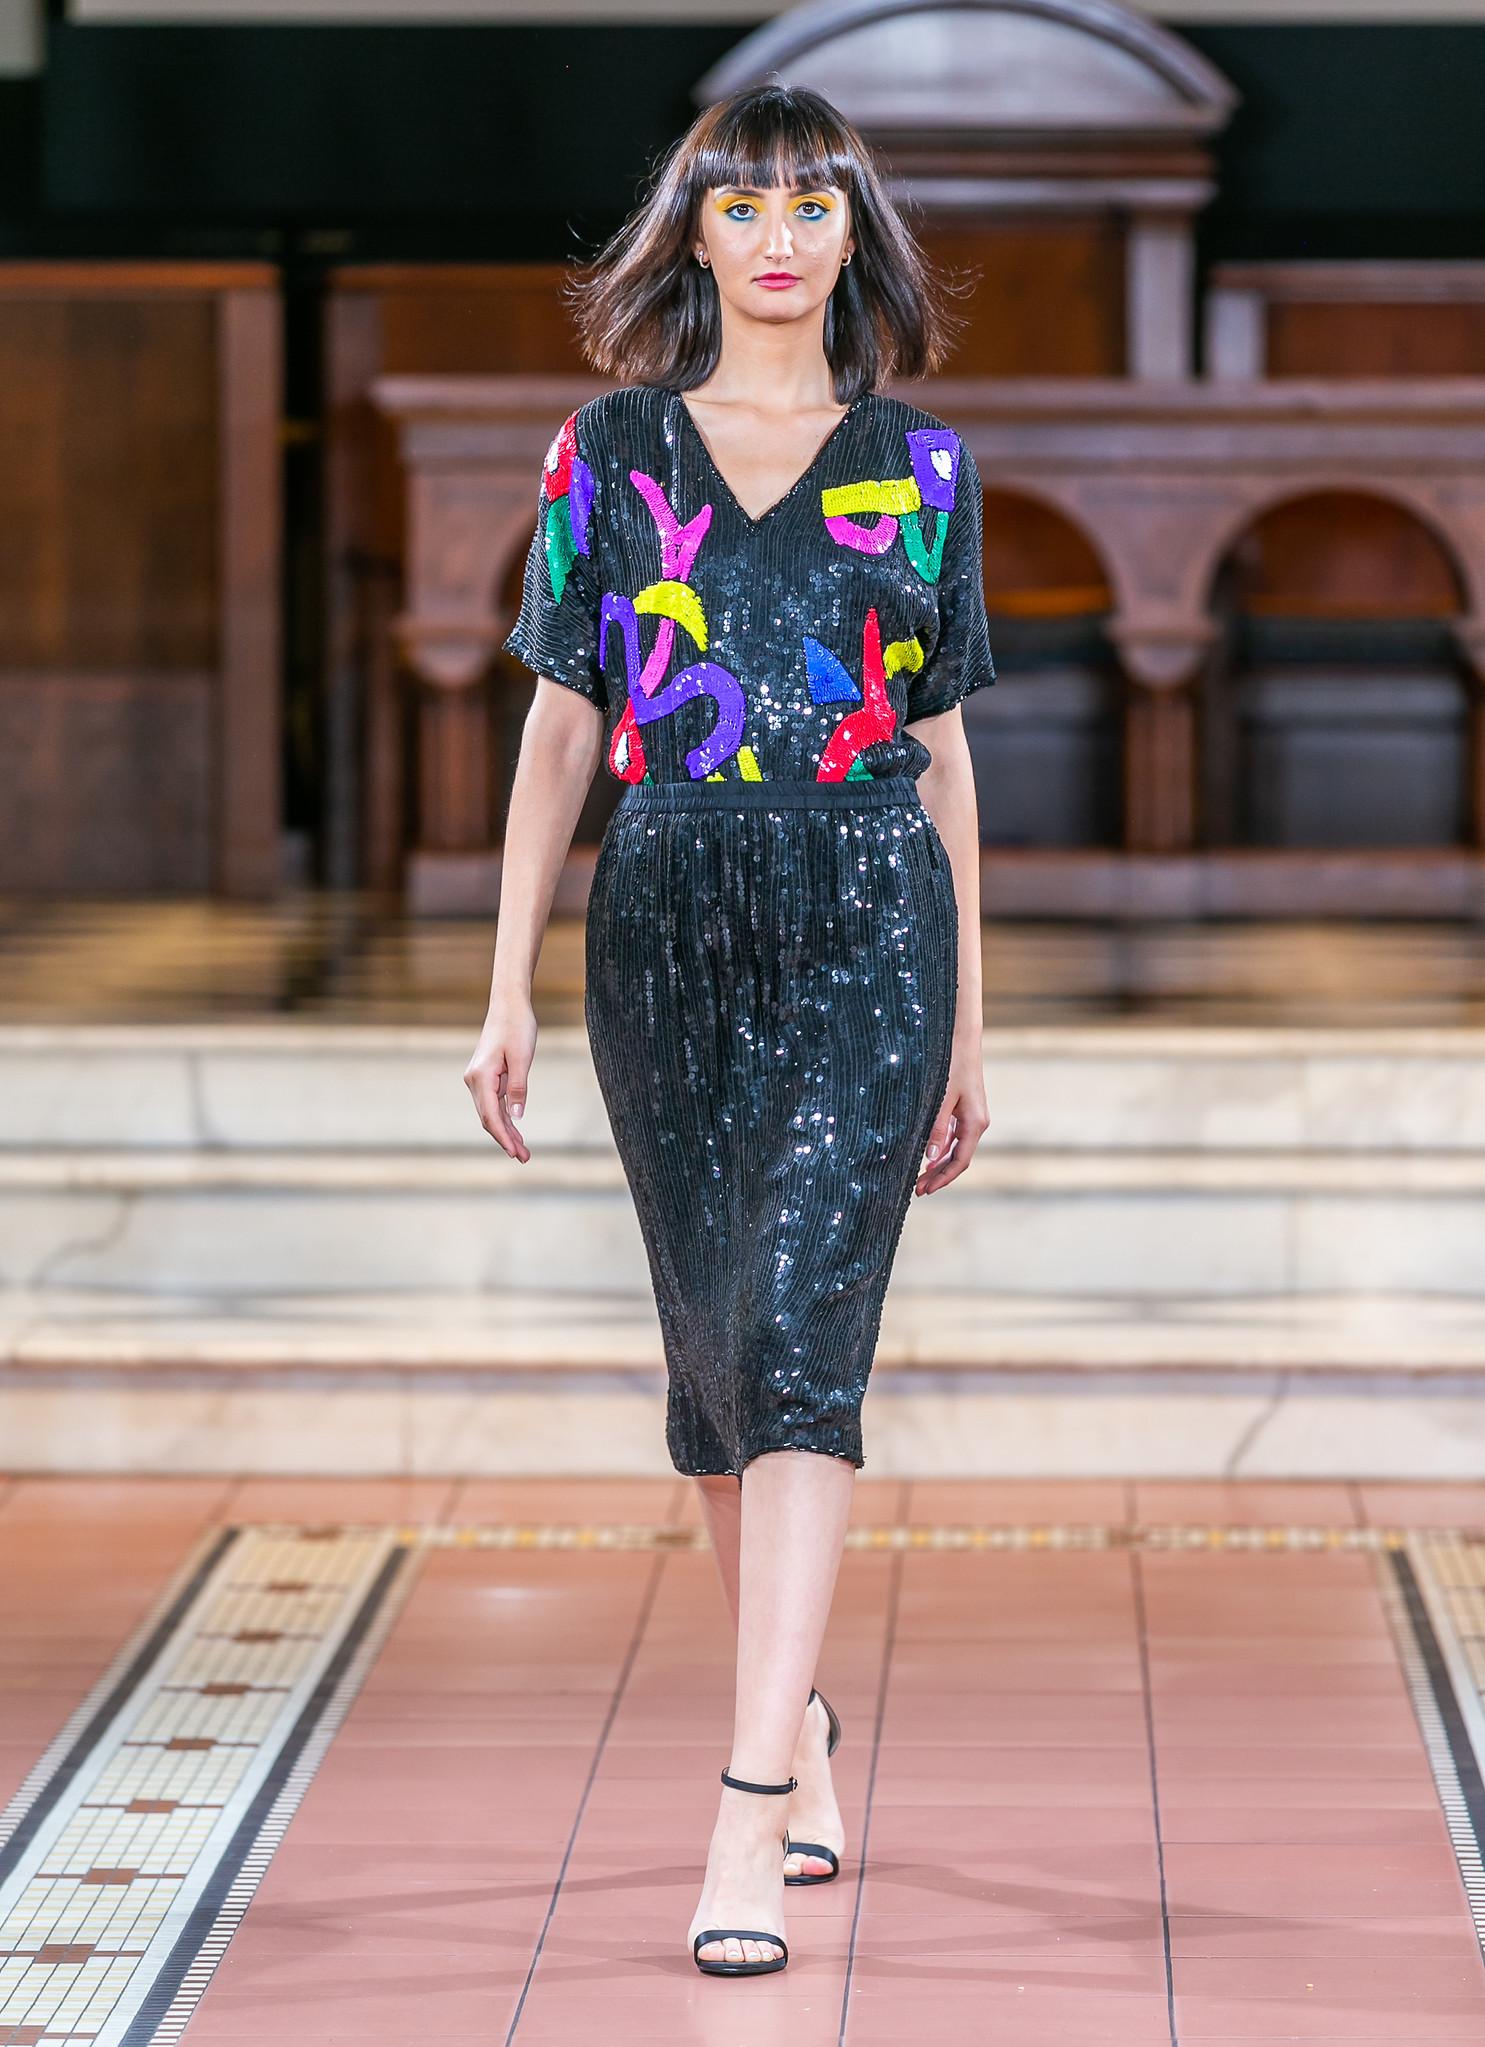 fashion-sizzle-boutique-beauty-fashion-week-2019-7